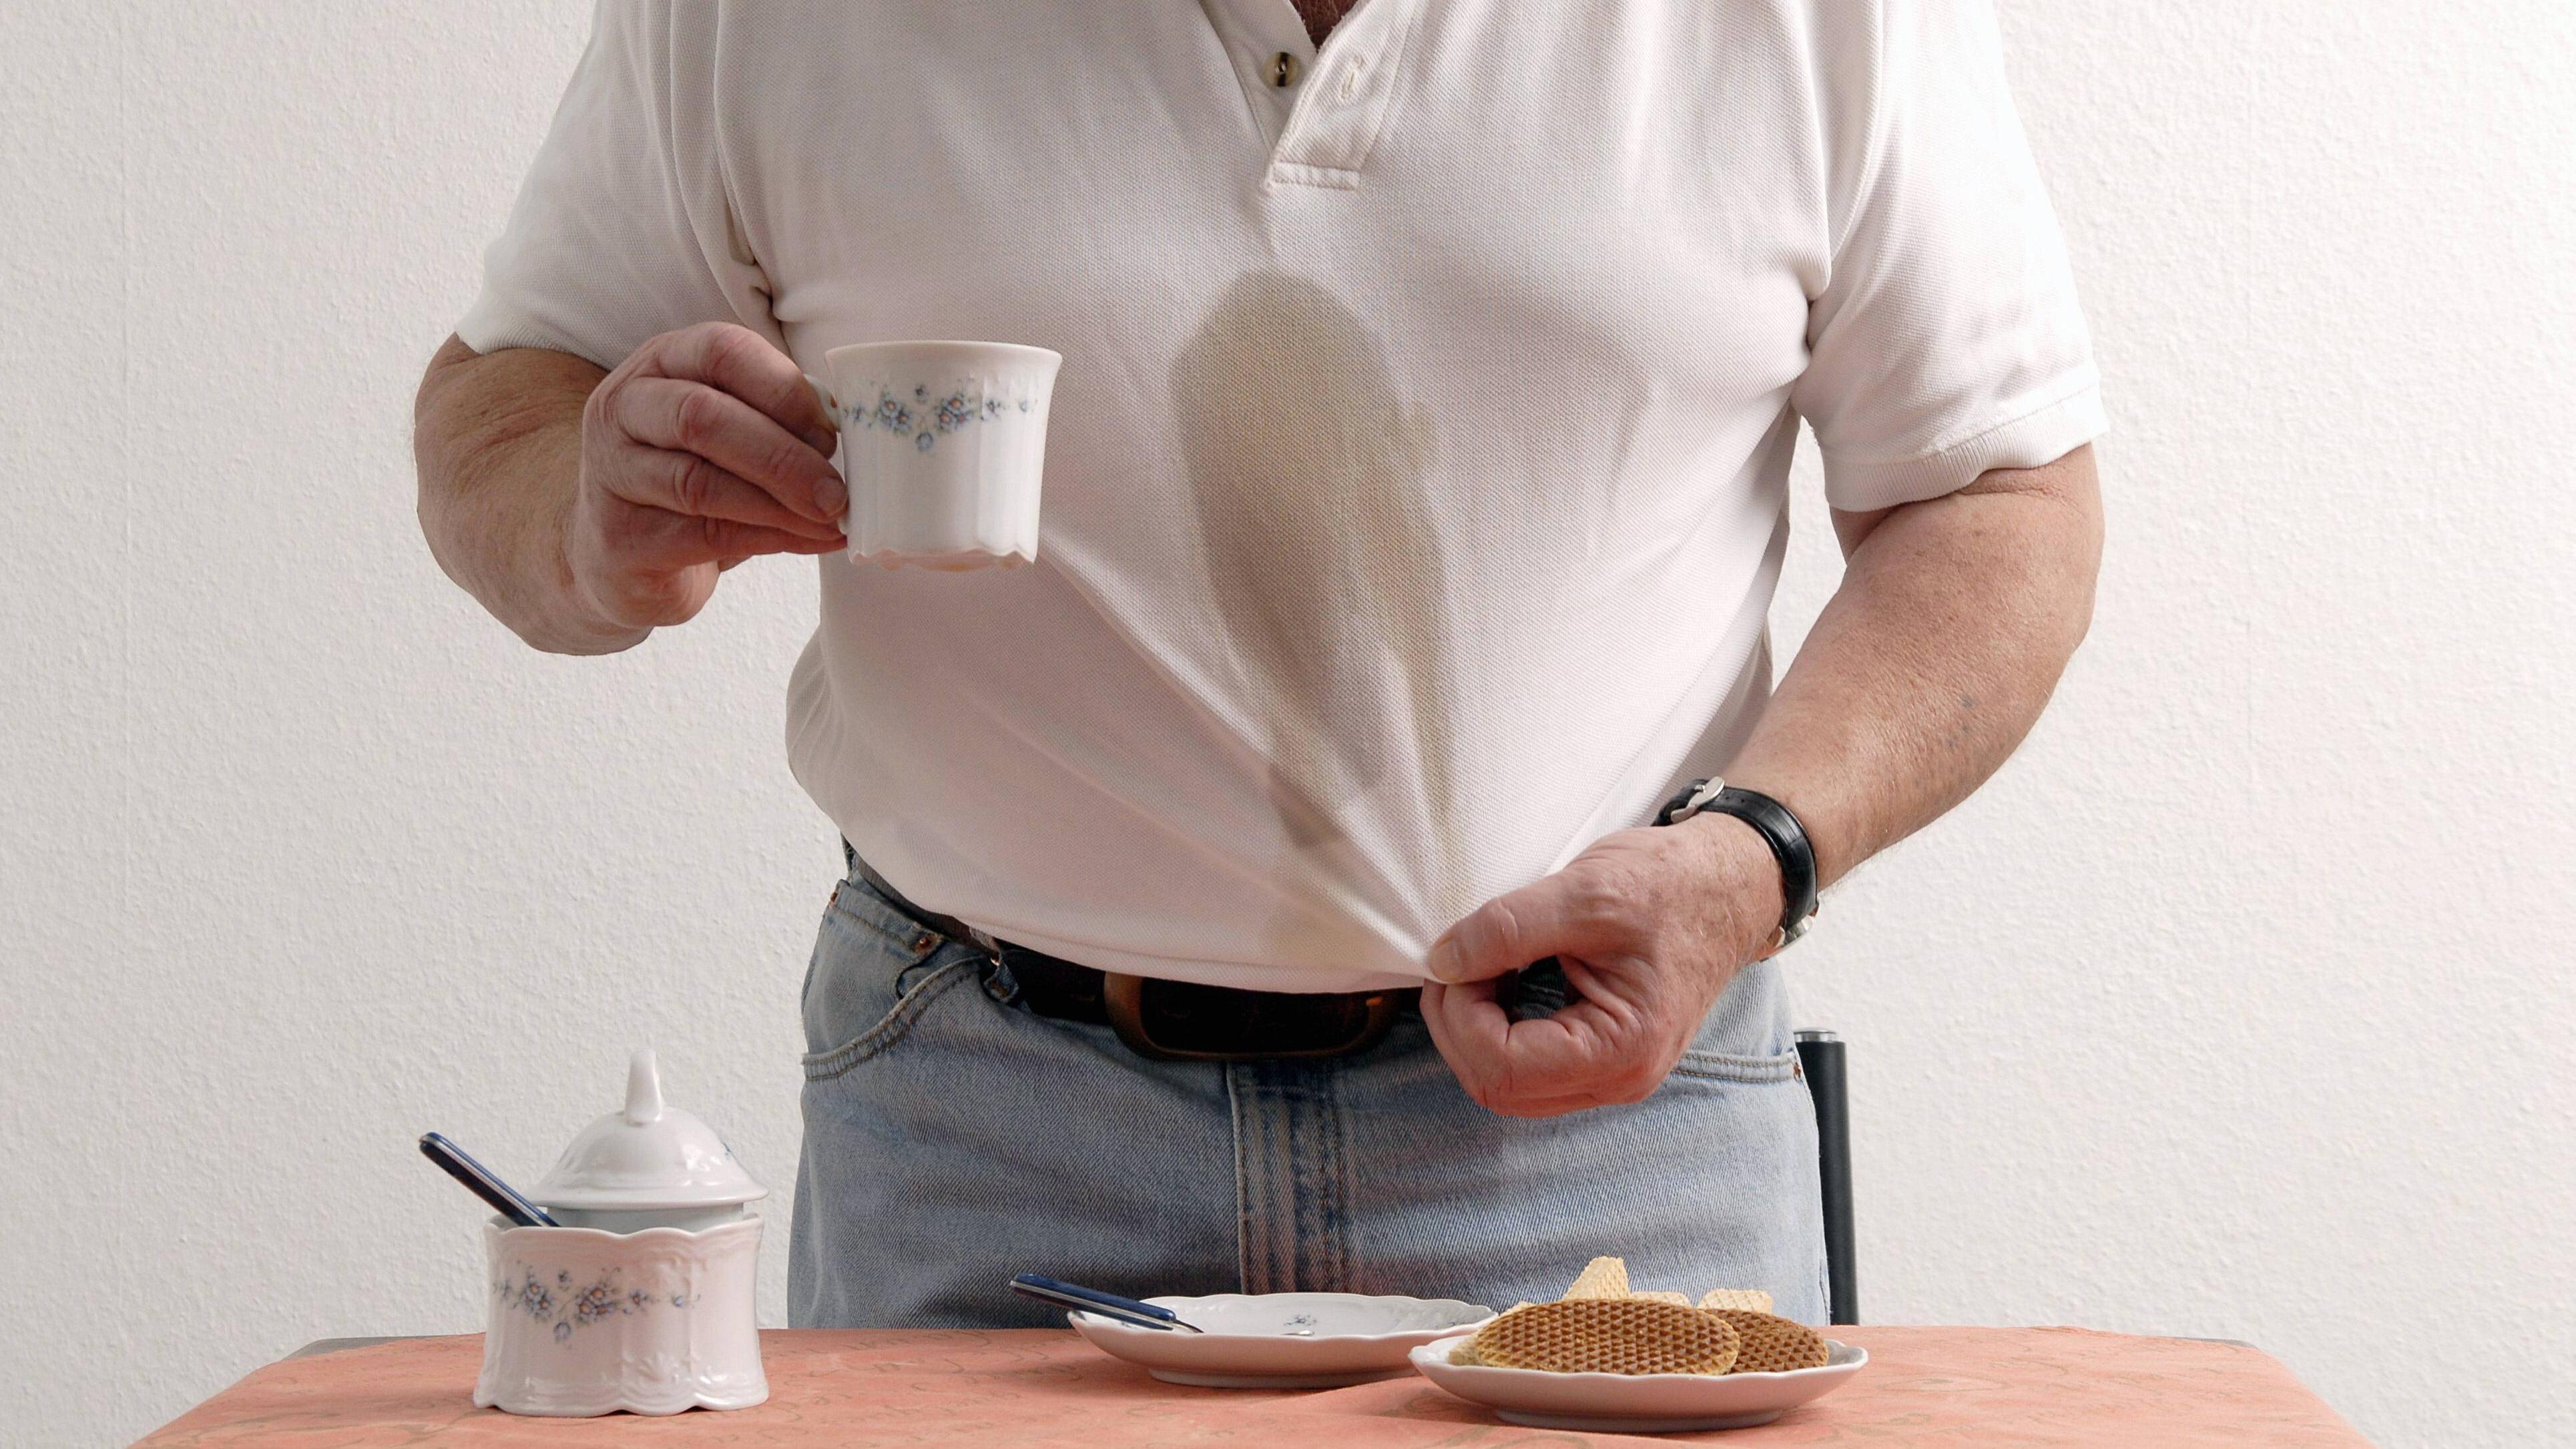 Kaffeeflecken lassen sich ganz leicht entfernen.